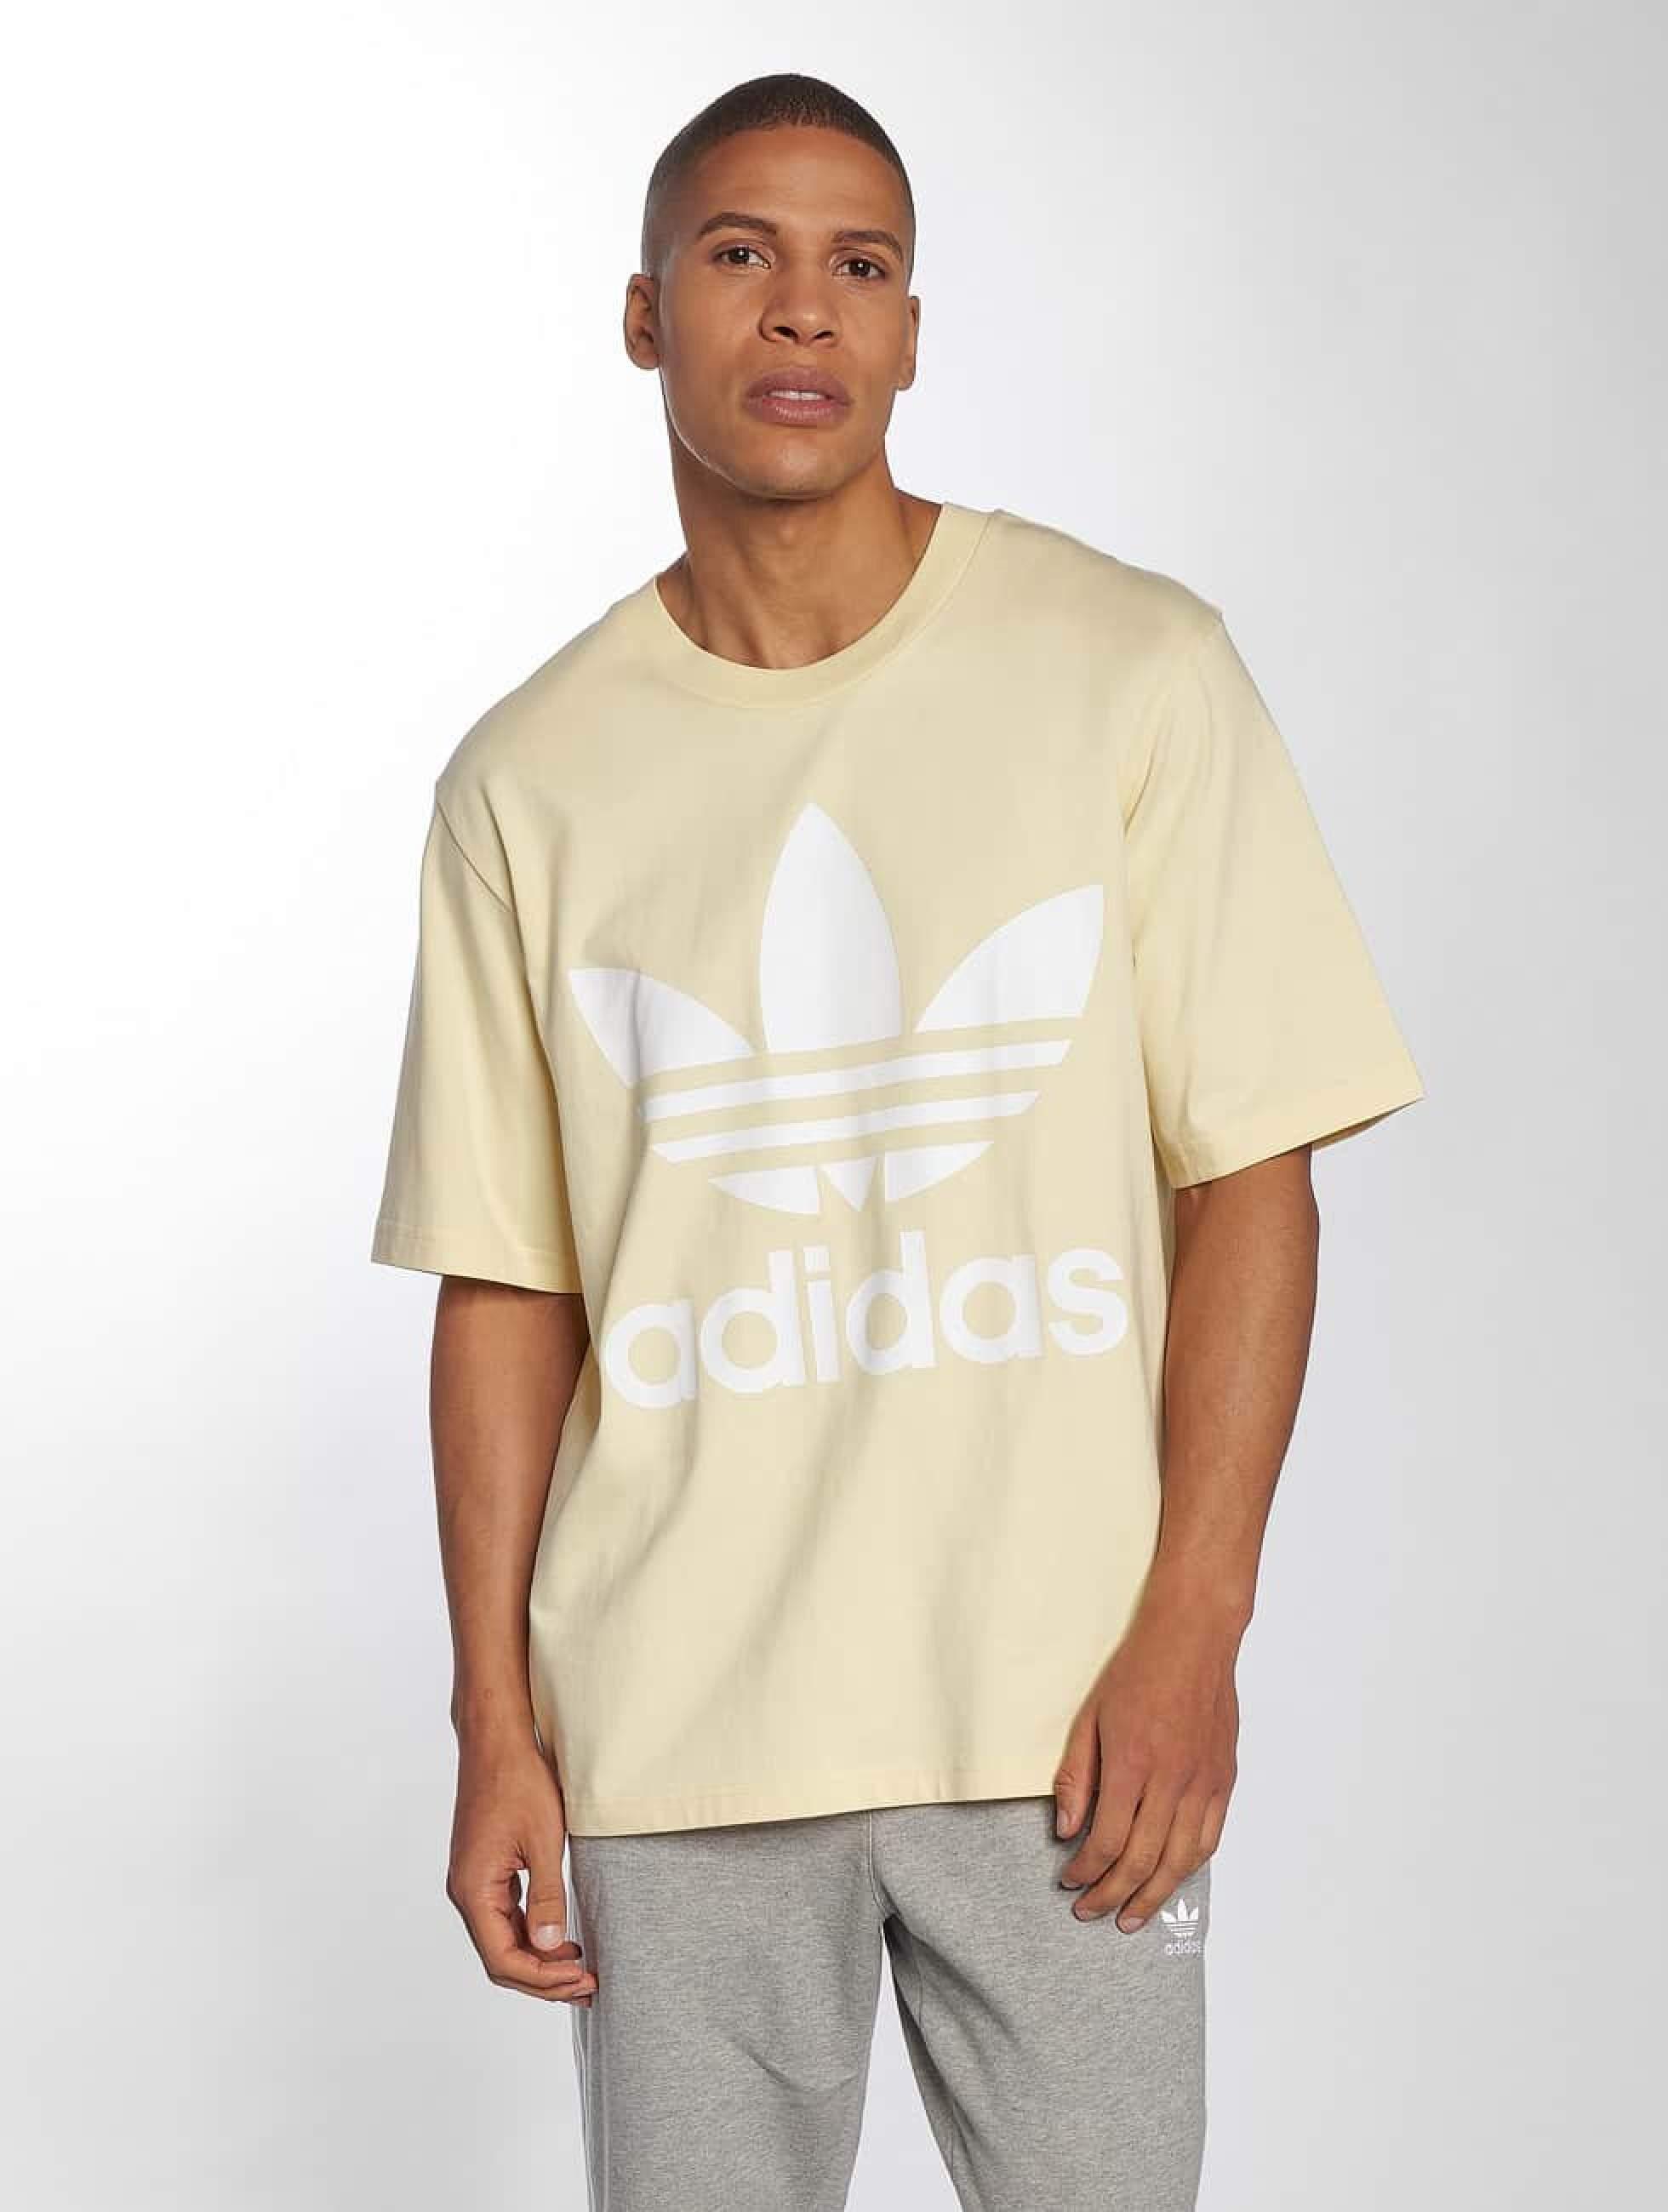 Adidas Originals Homme Hauts Hauts T Shirt Oversized 536511